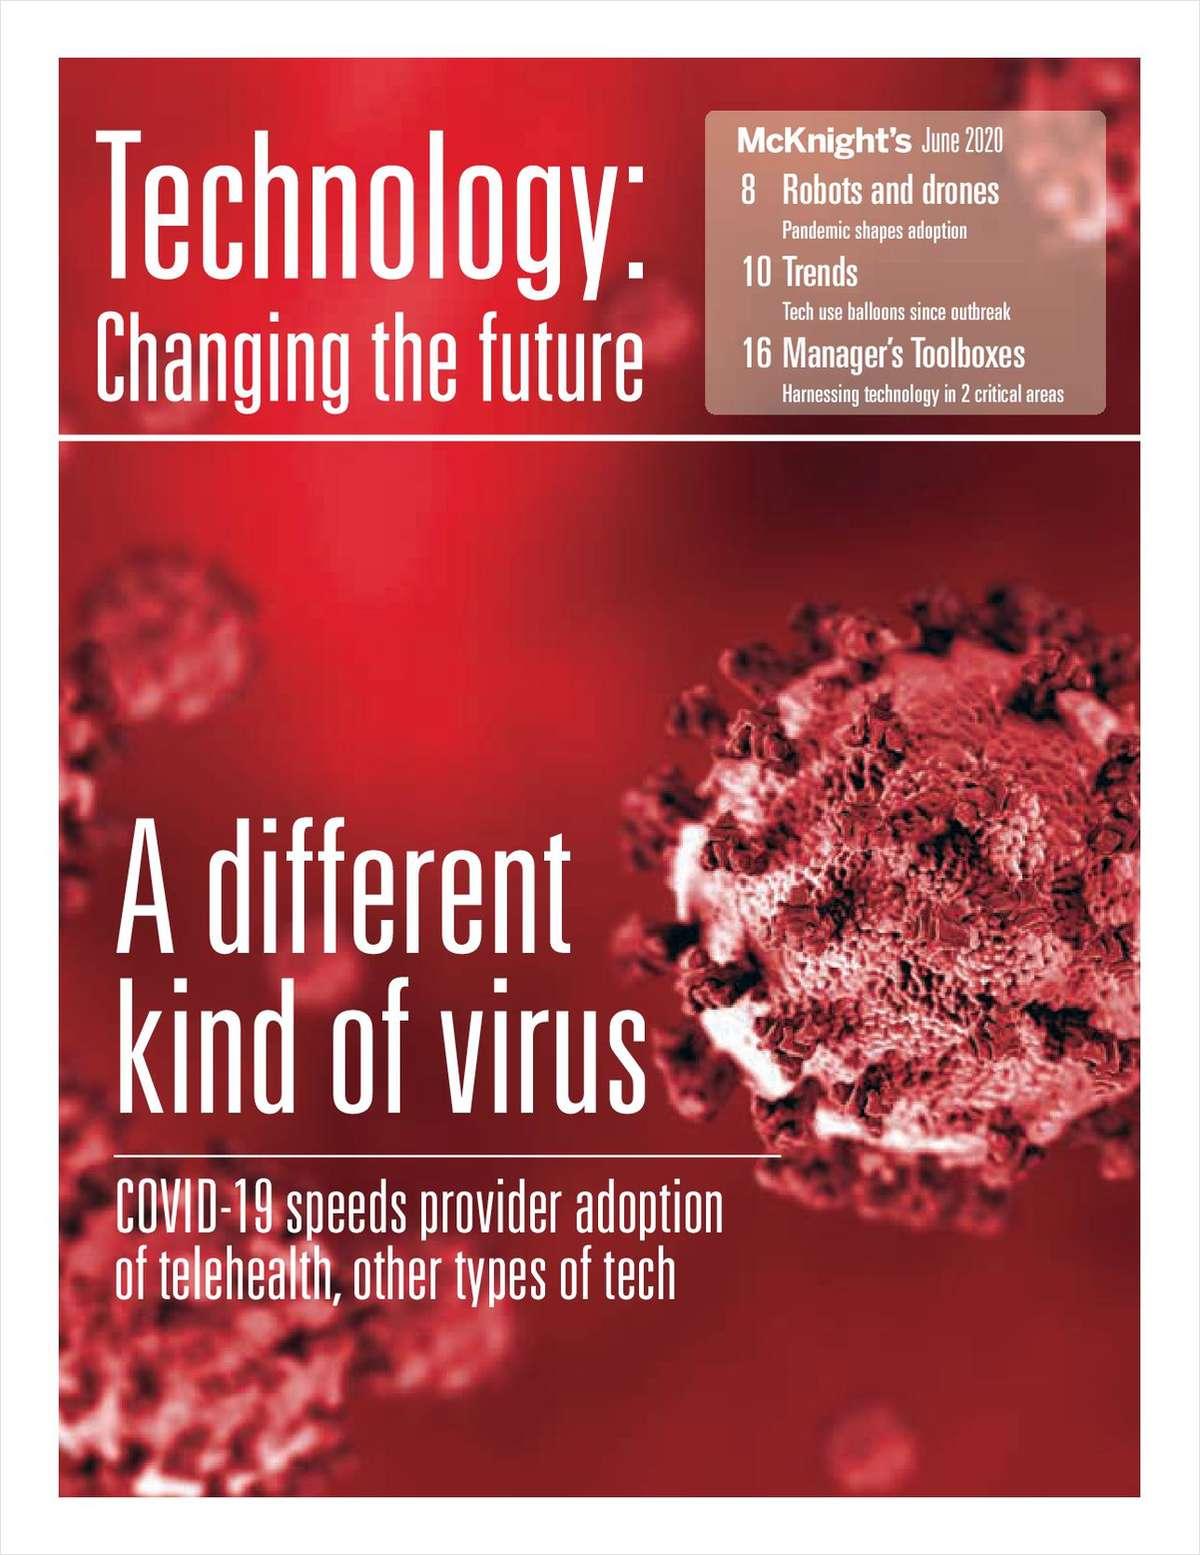 2020 McKnight's Technology Supplement